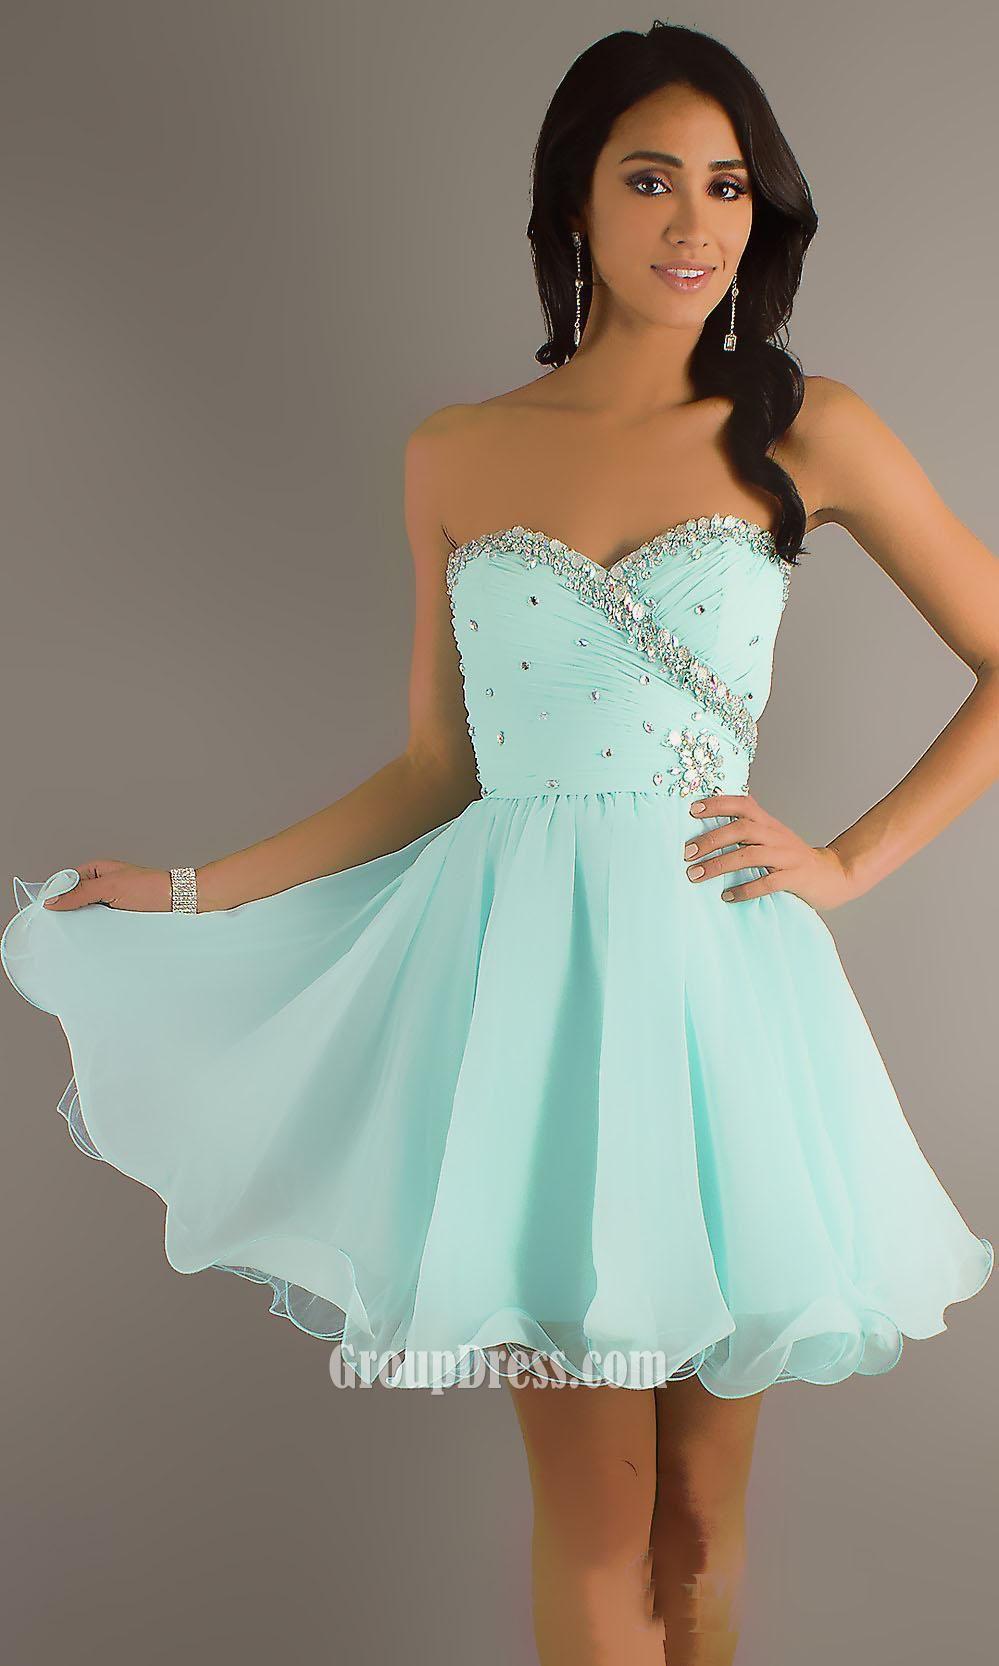 aqua-chiffon-beaded-sweetheart-strapless-a-line-short-prom-dress-1 ...